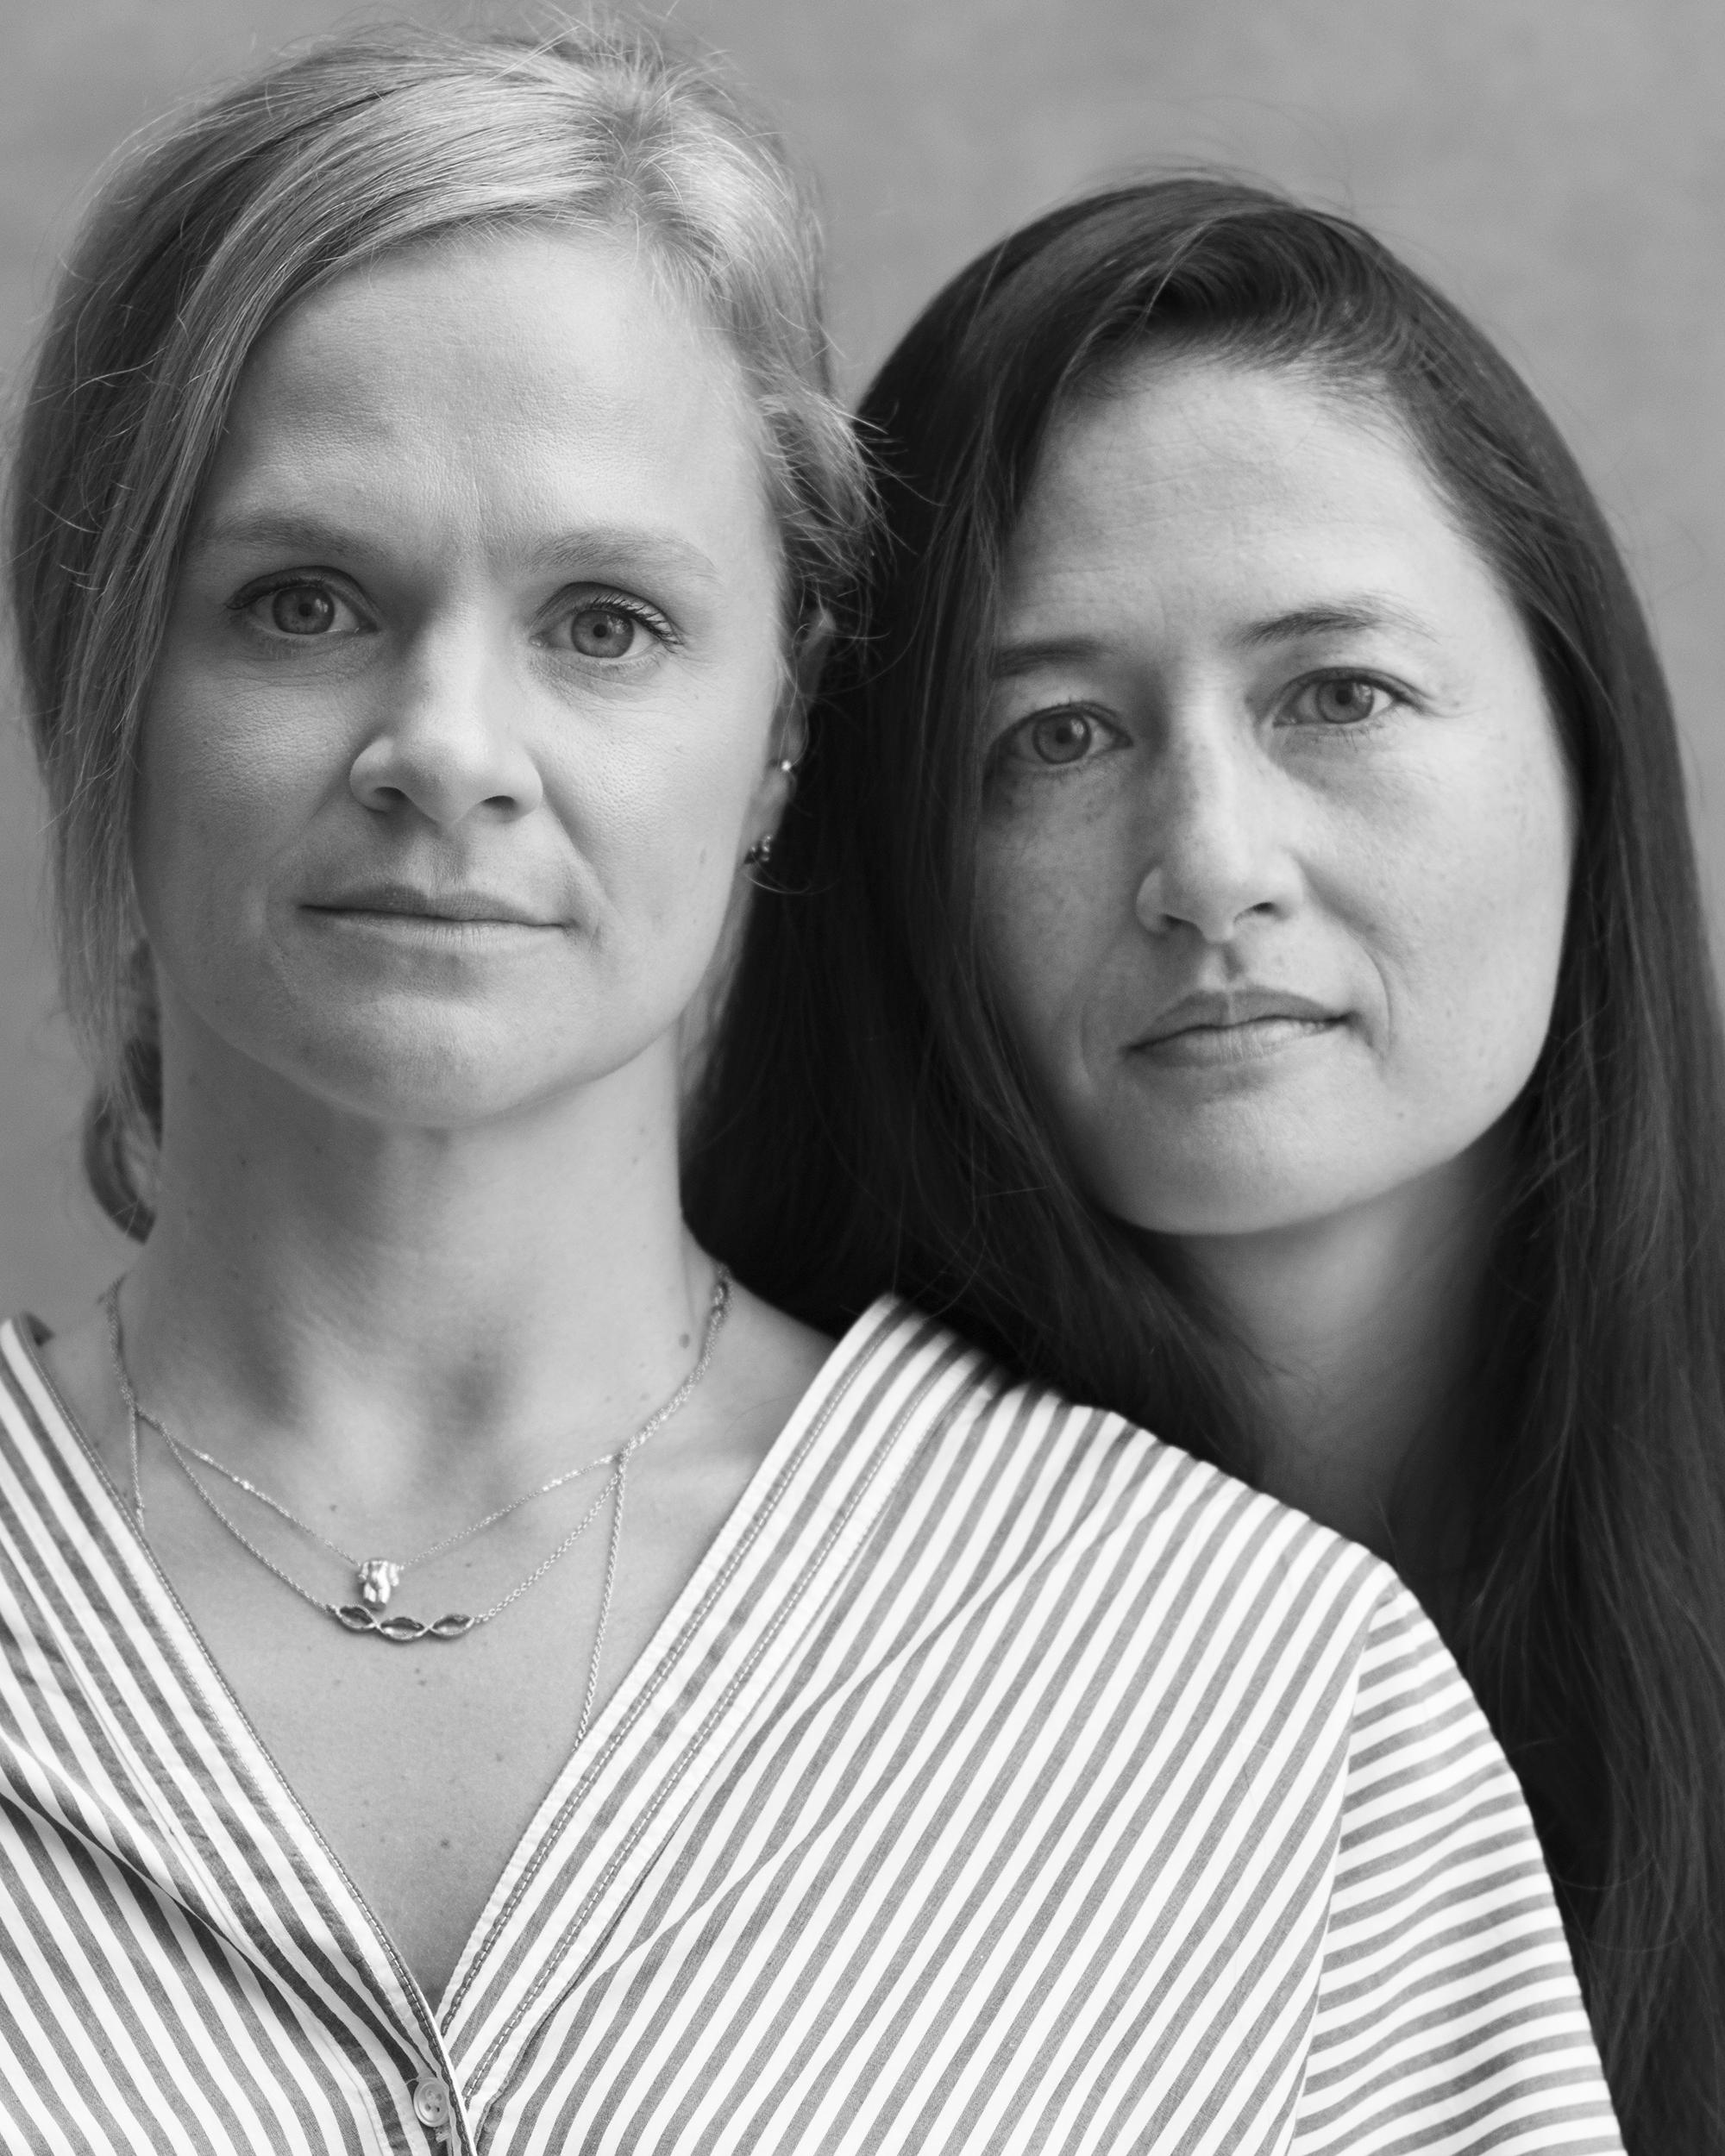 Libby Pratt and Michi Jigarjian